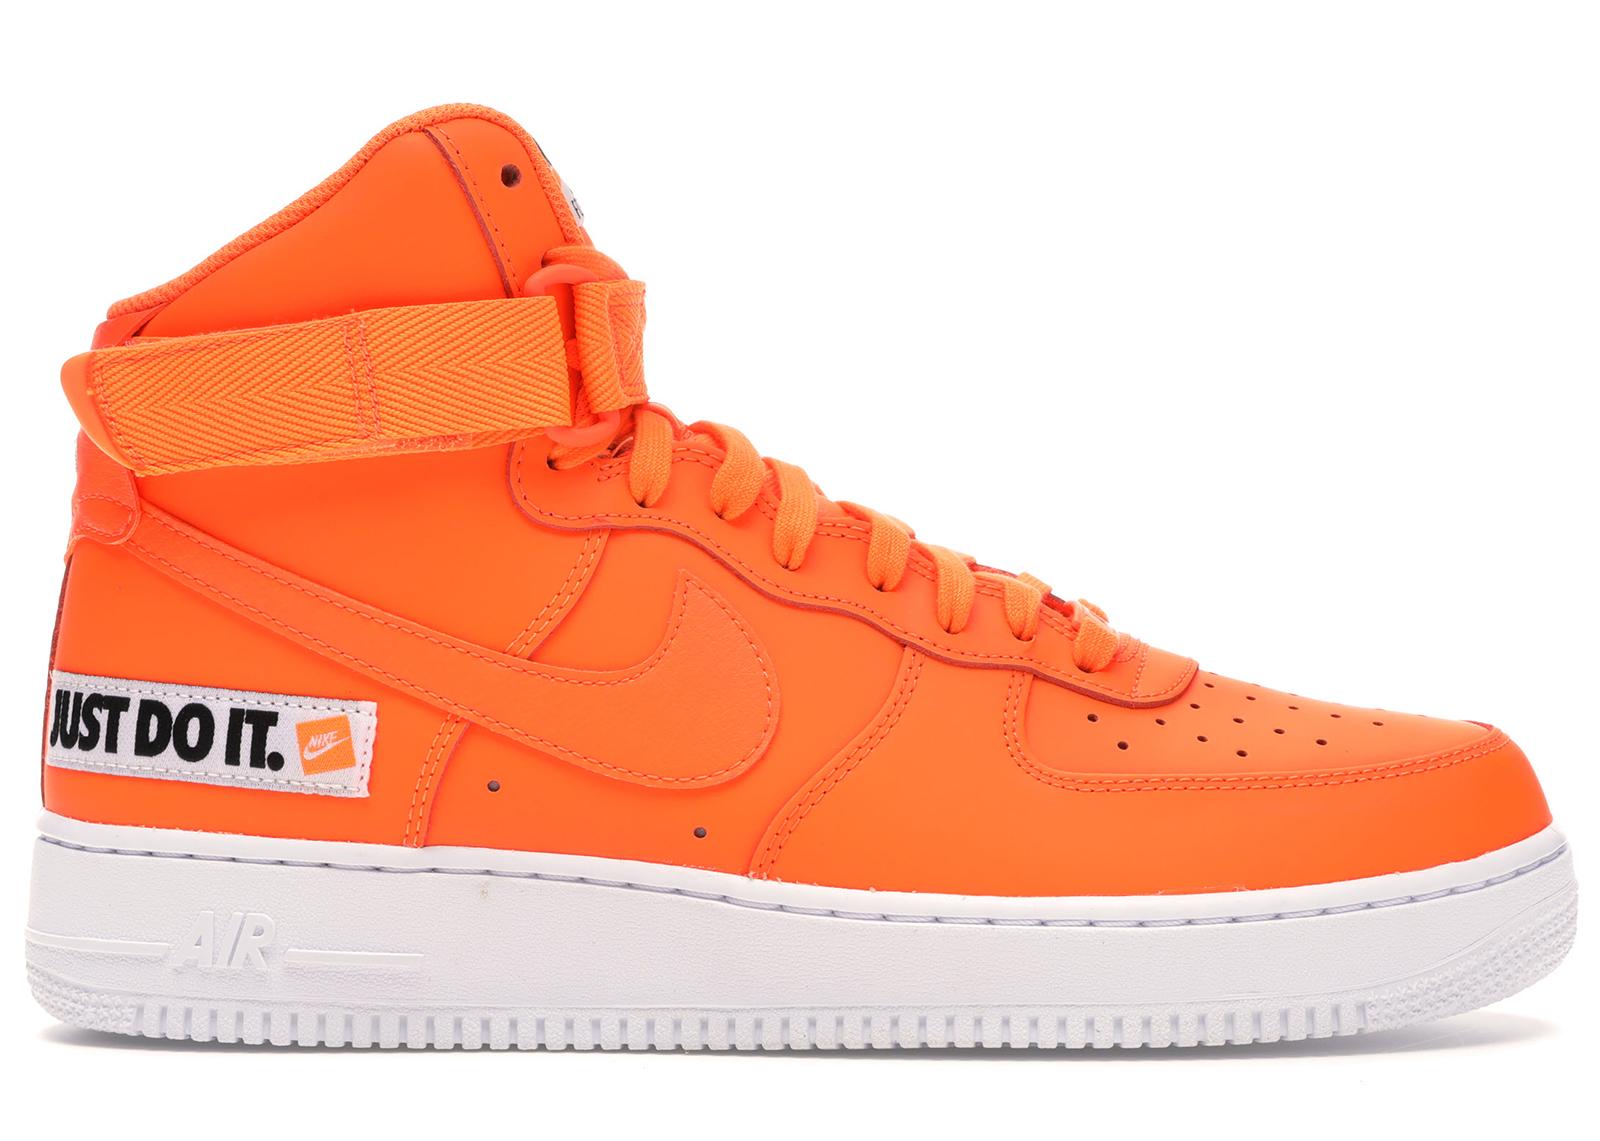 Nike Air Force 1 High Just Do It Pack Orange - BQ6474-800